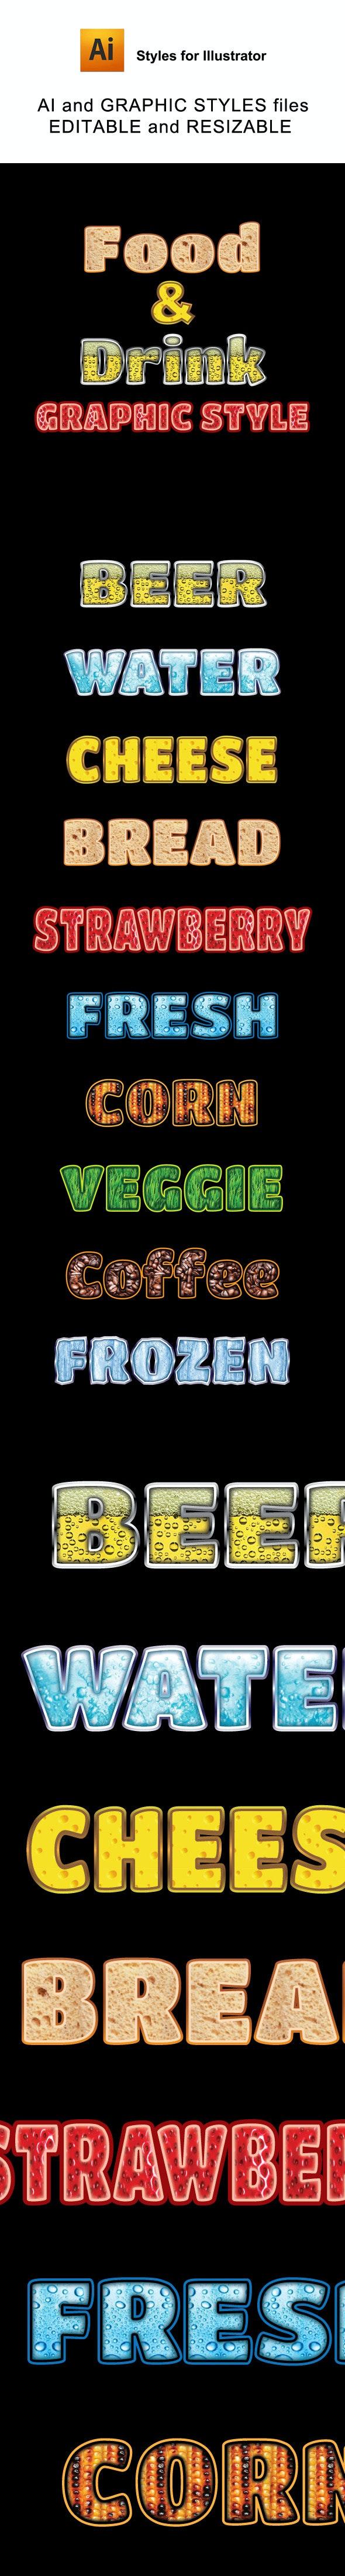 Food & Drink Graphic Styles - Styles Illustrator